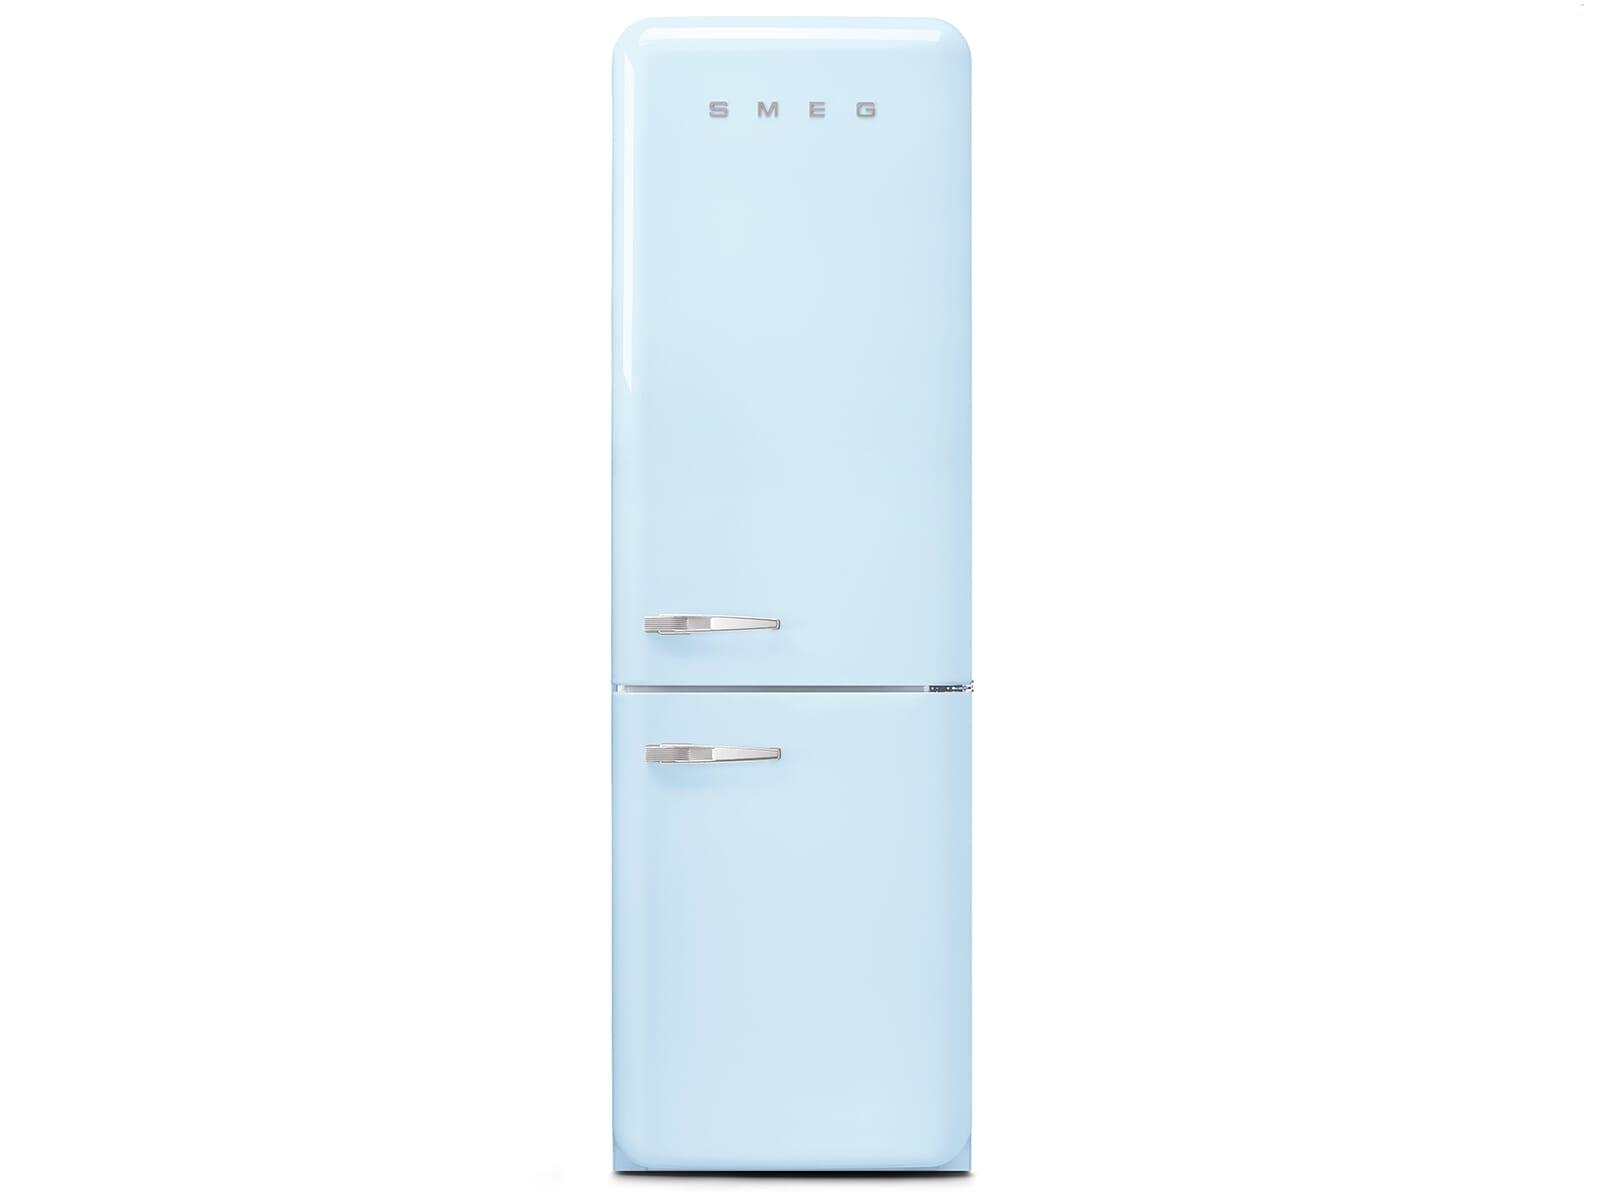 Smeg Kühlschrank Gefrierkombi : Smeg fab rpb kühl gefrierkombination pastellblau